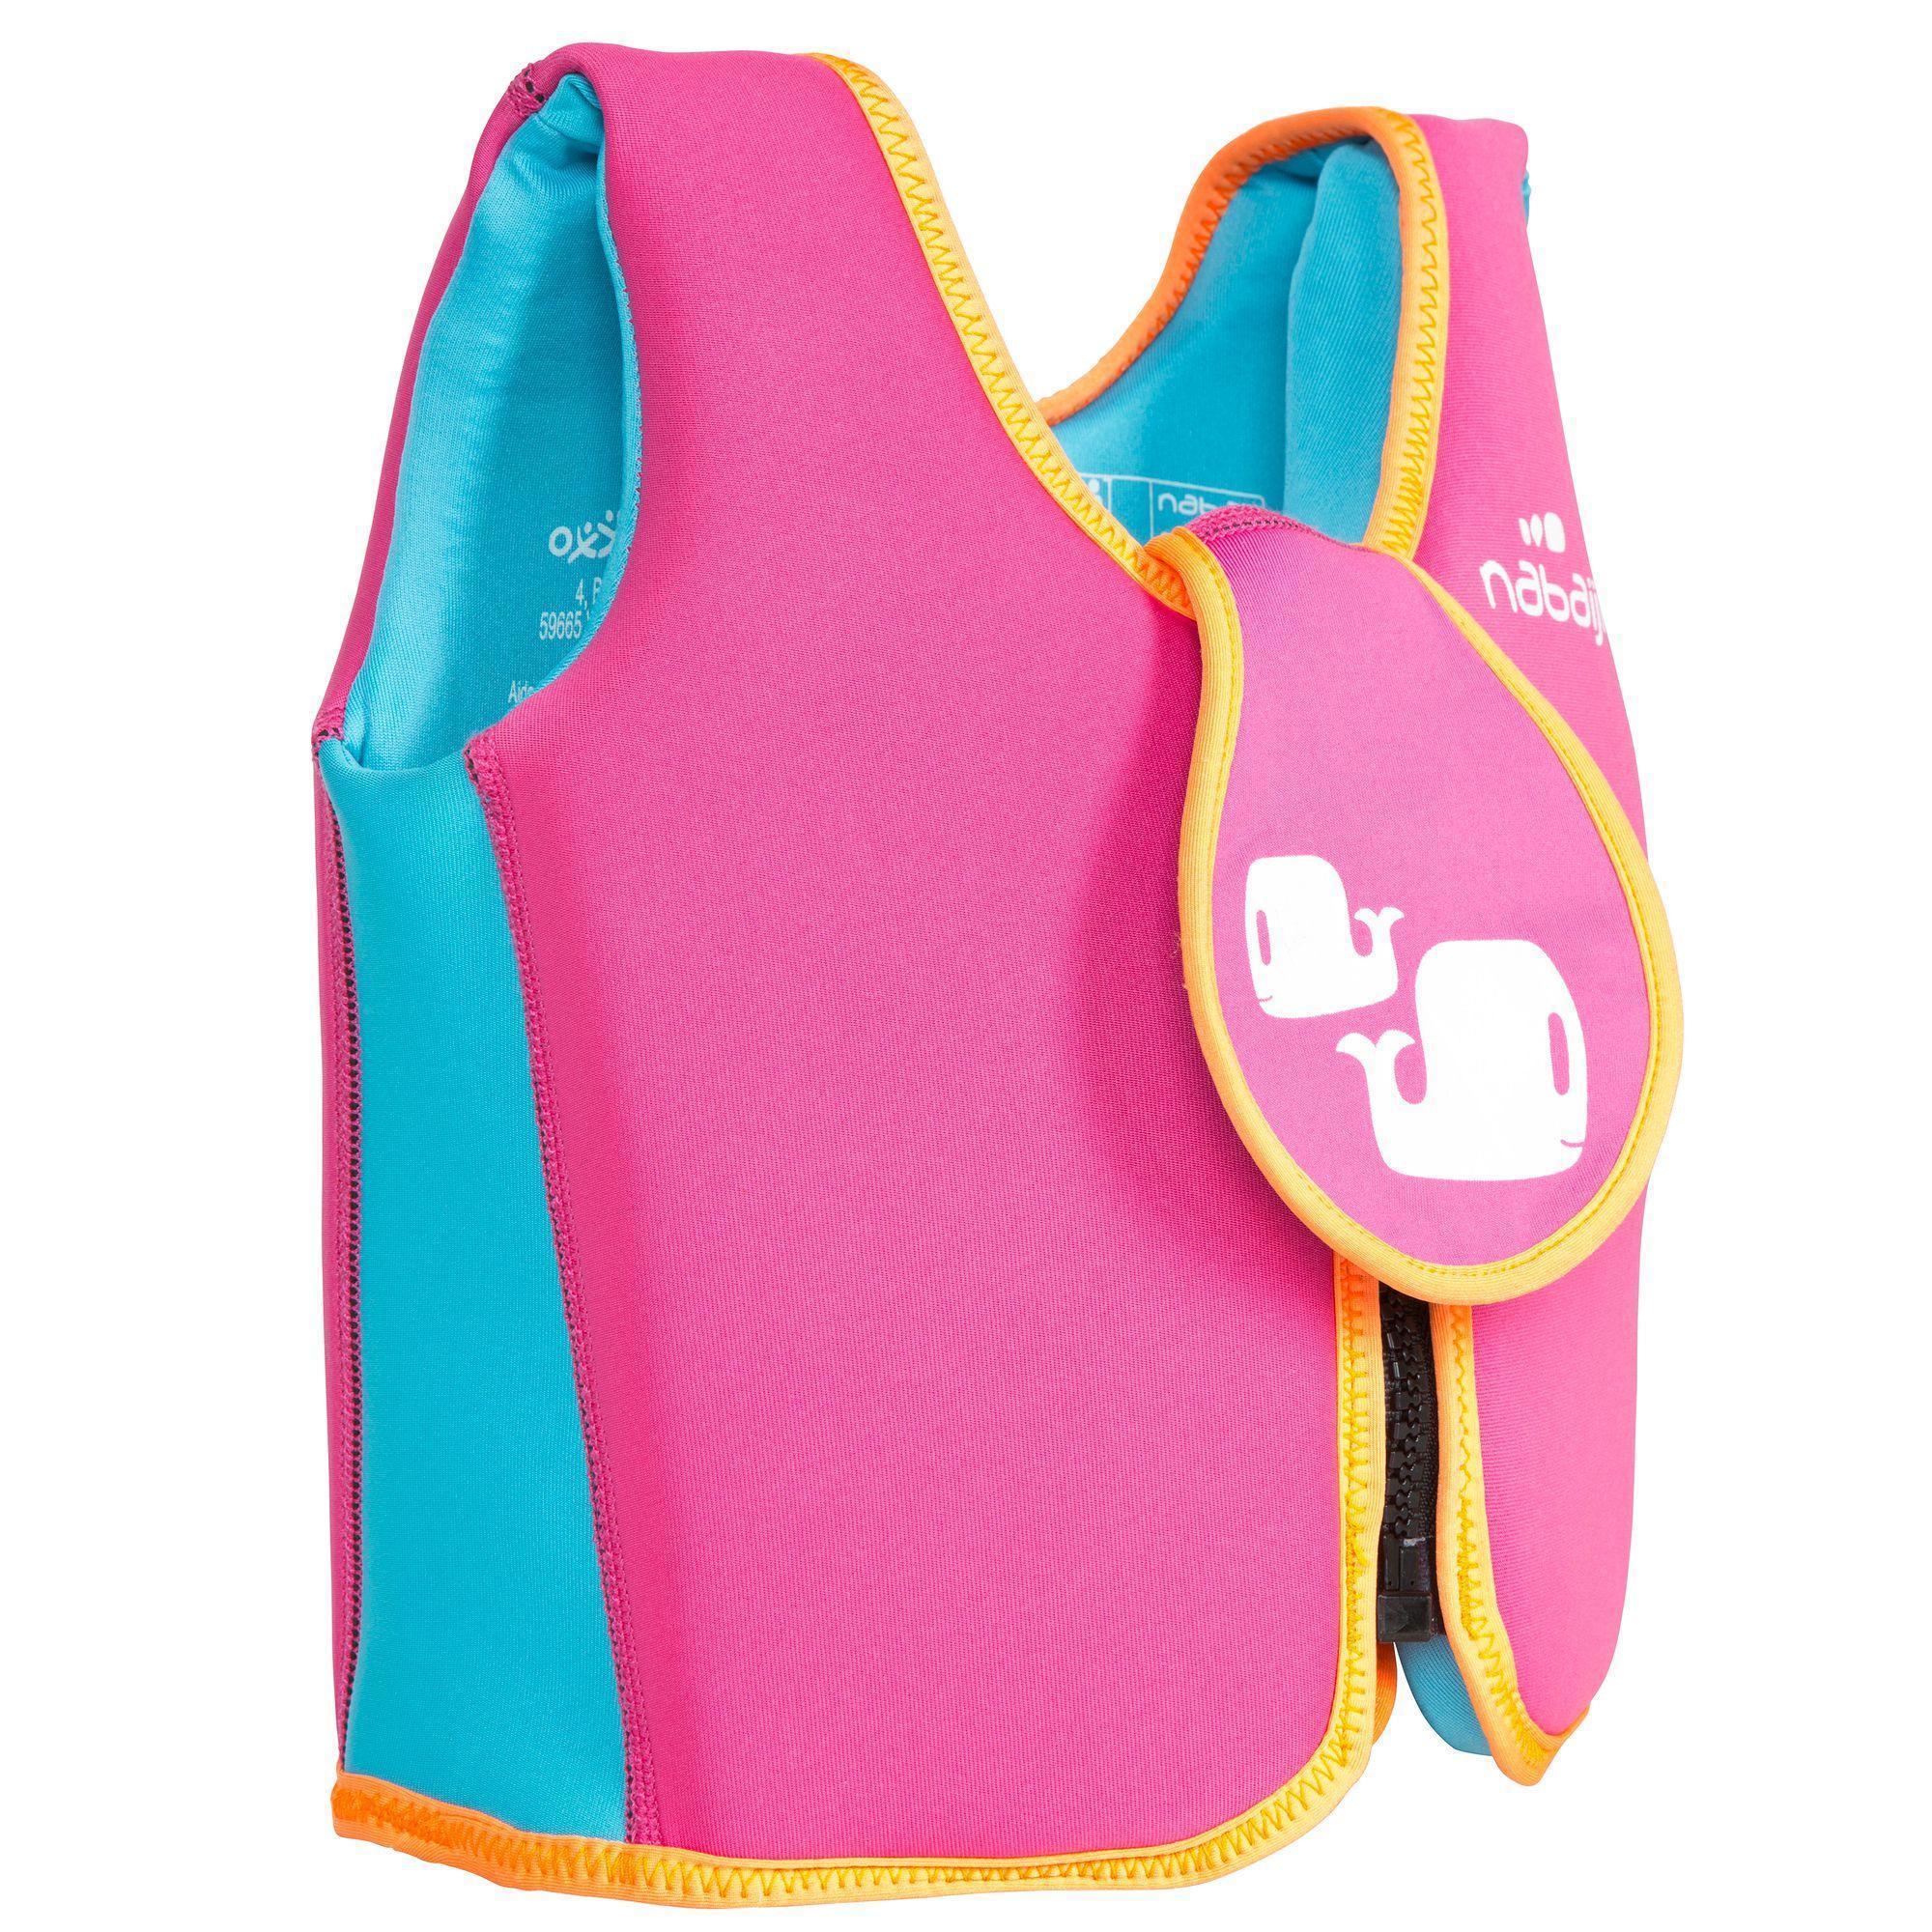 Gilet de natation rose jaune nabaiji - Maillot de bain piscine decathlon ...